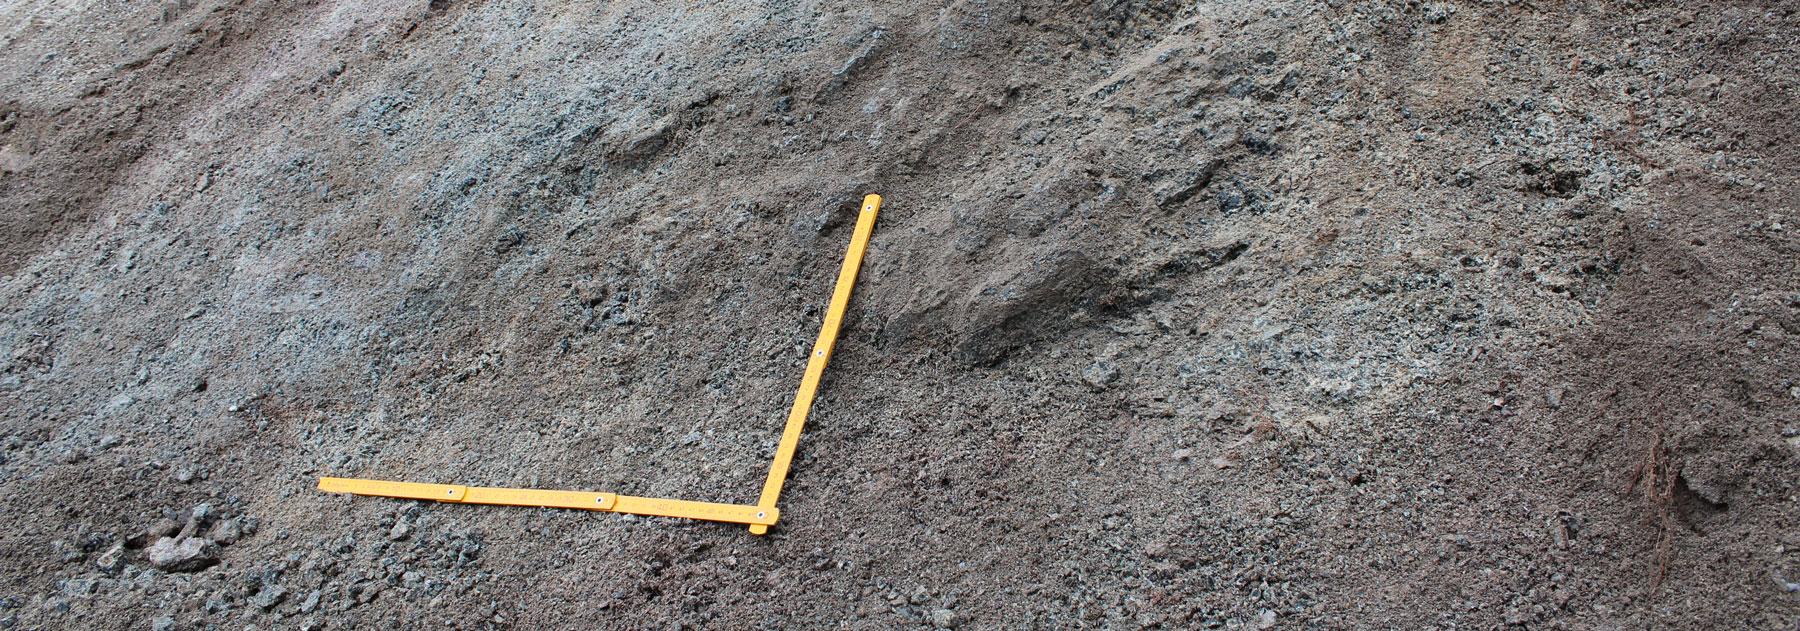 archeological dig detail